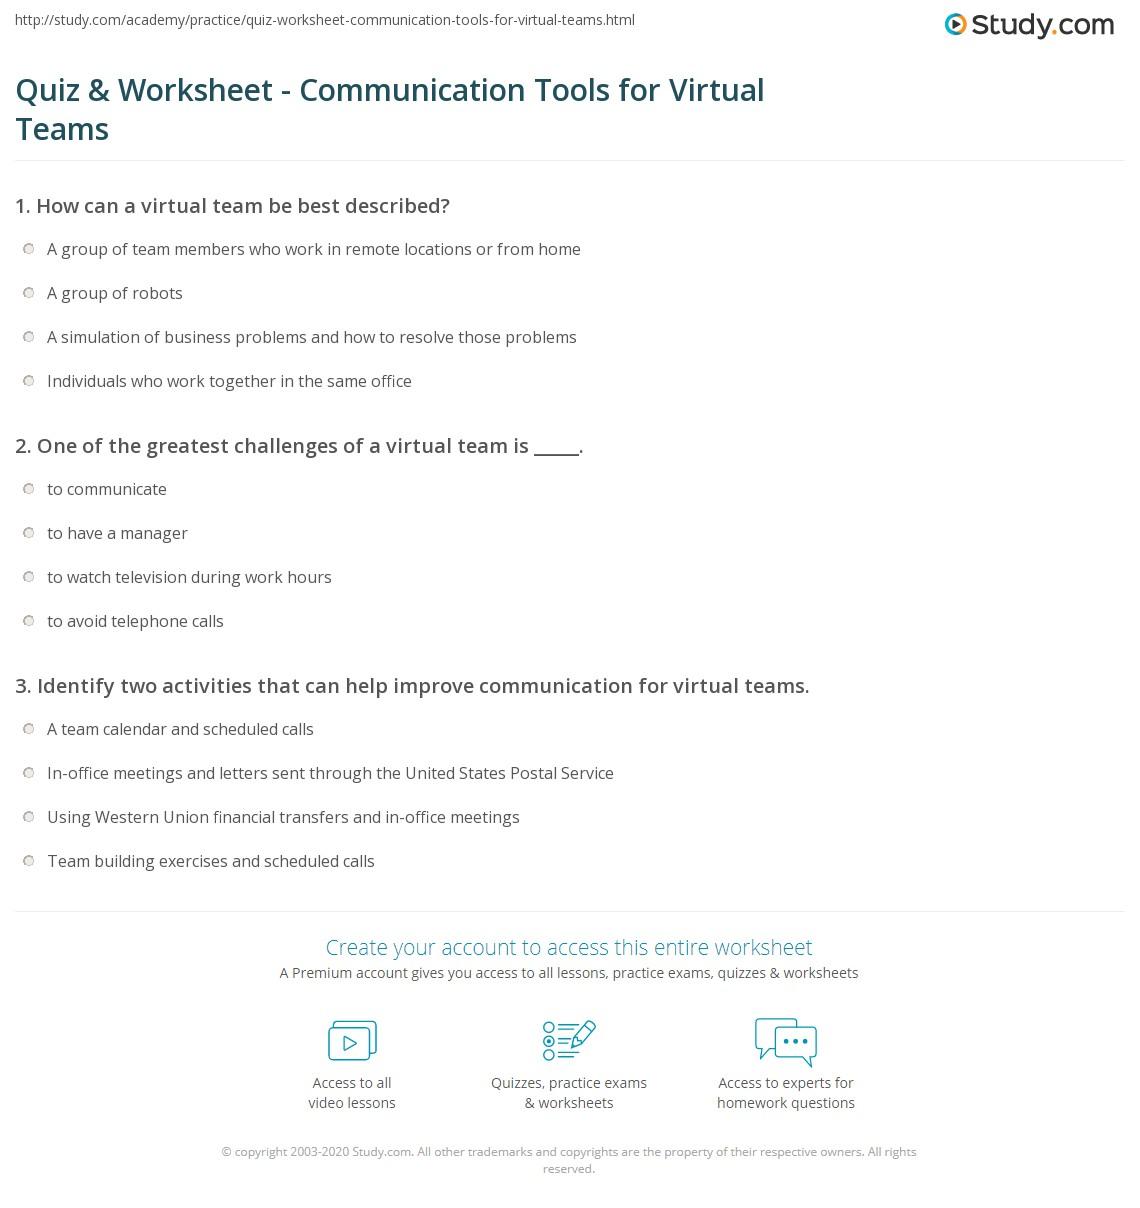 quiz worksheet communication tools for virtual teams. Black Bedroom Furniture Sets. Home Design Ideas